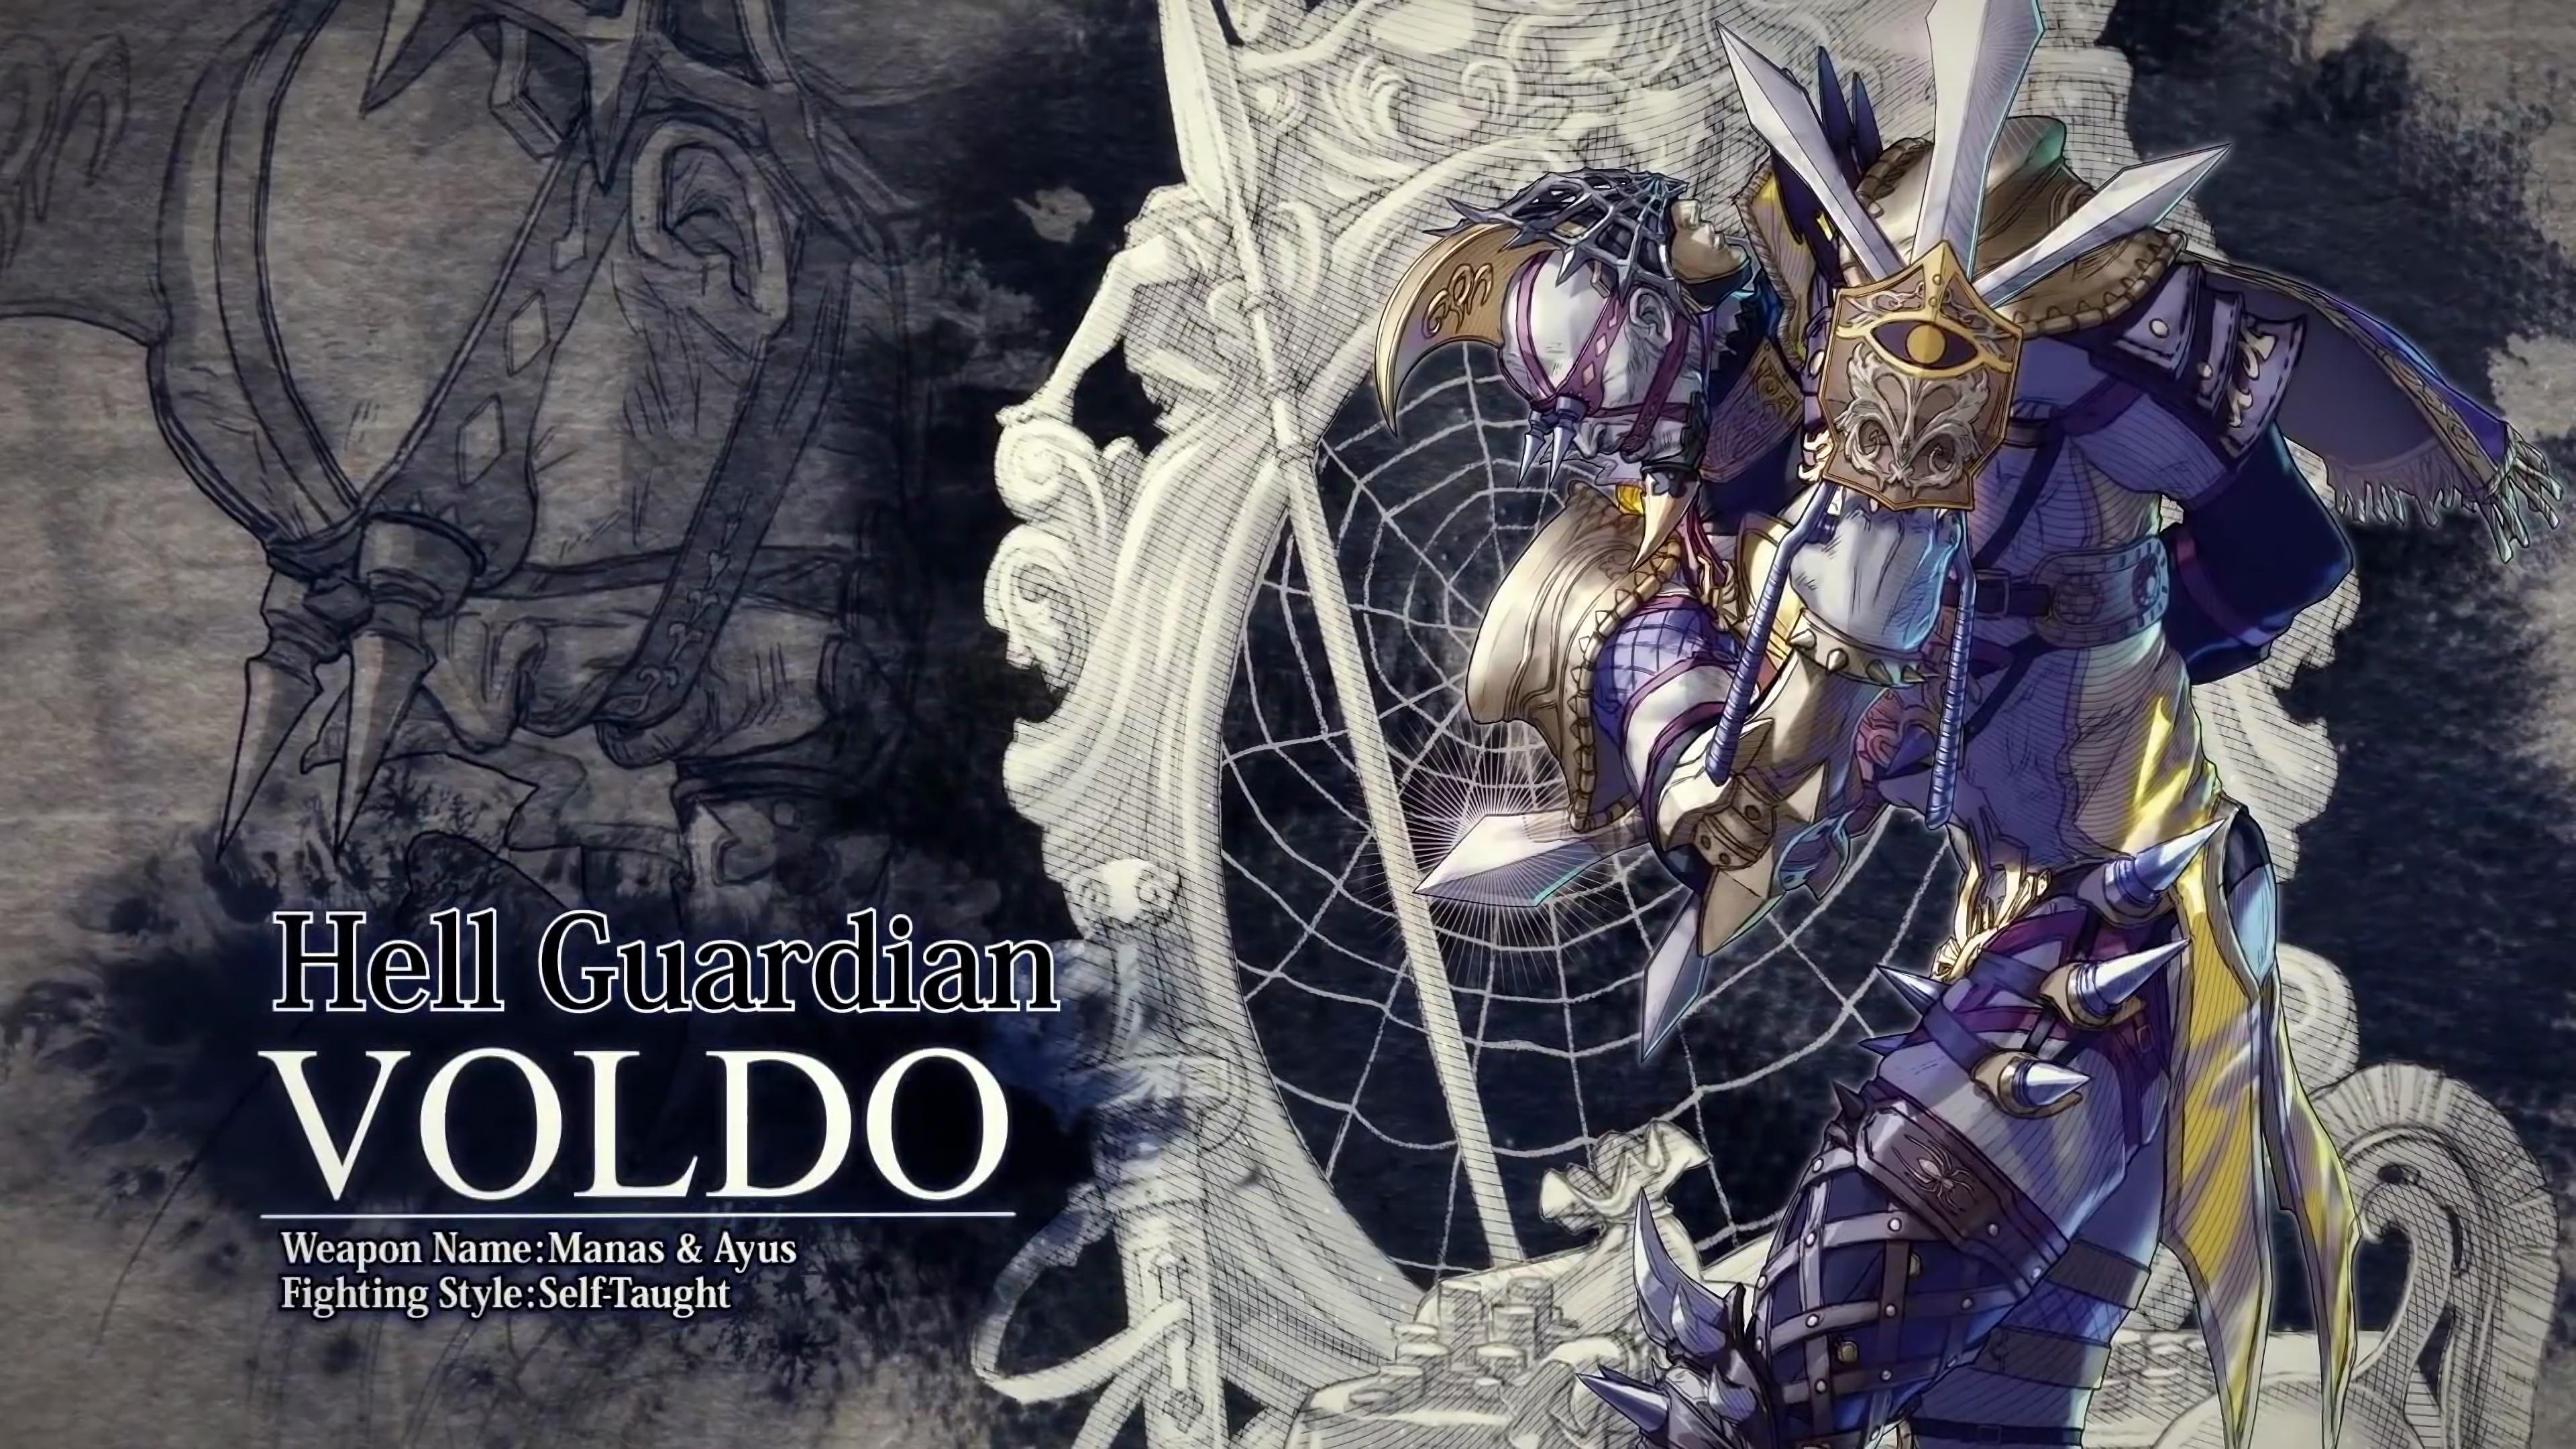 Вольдо - SoulCalibur 6 4K, Арт